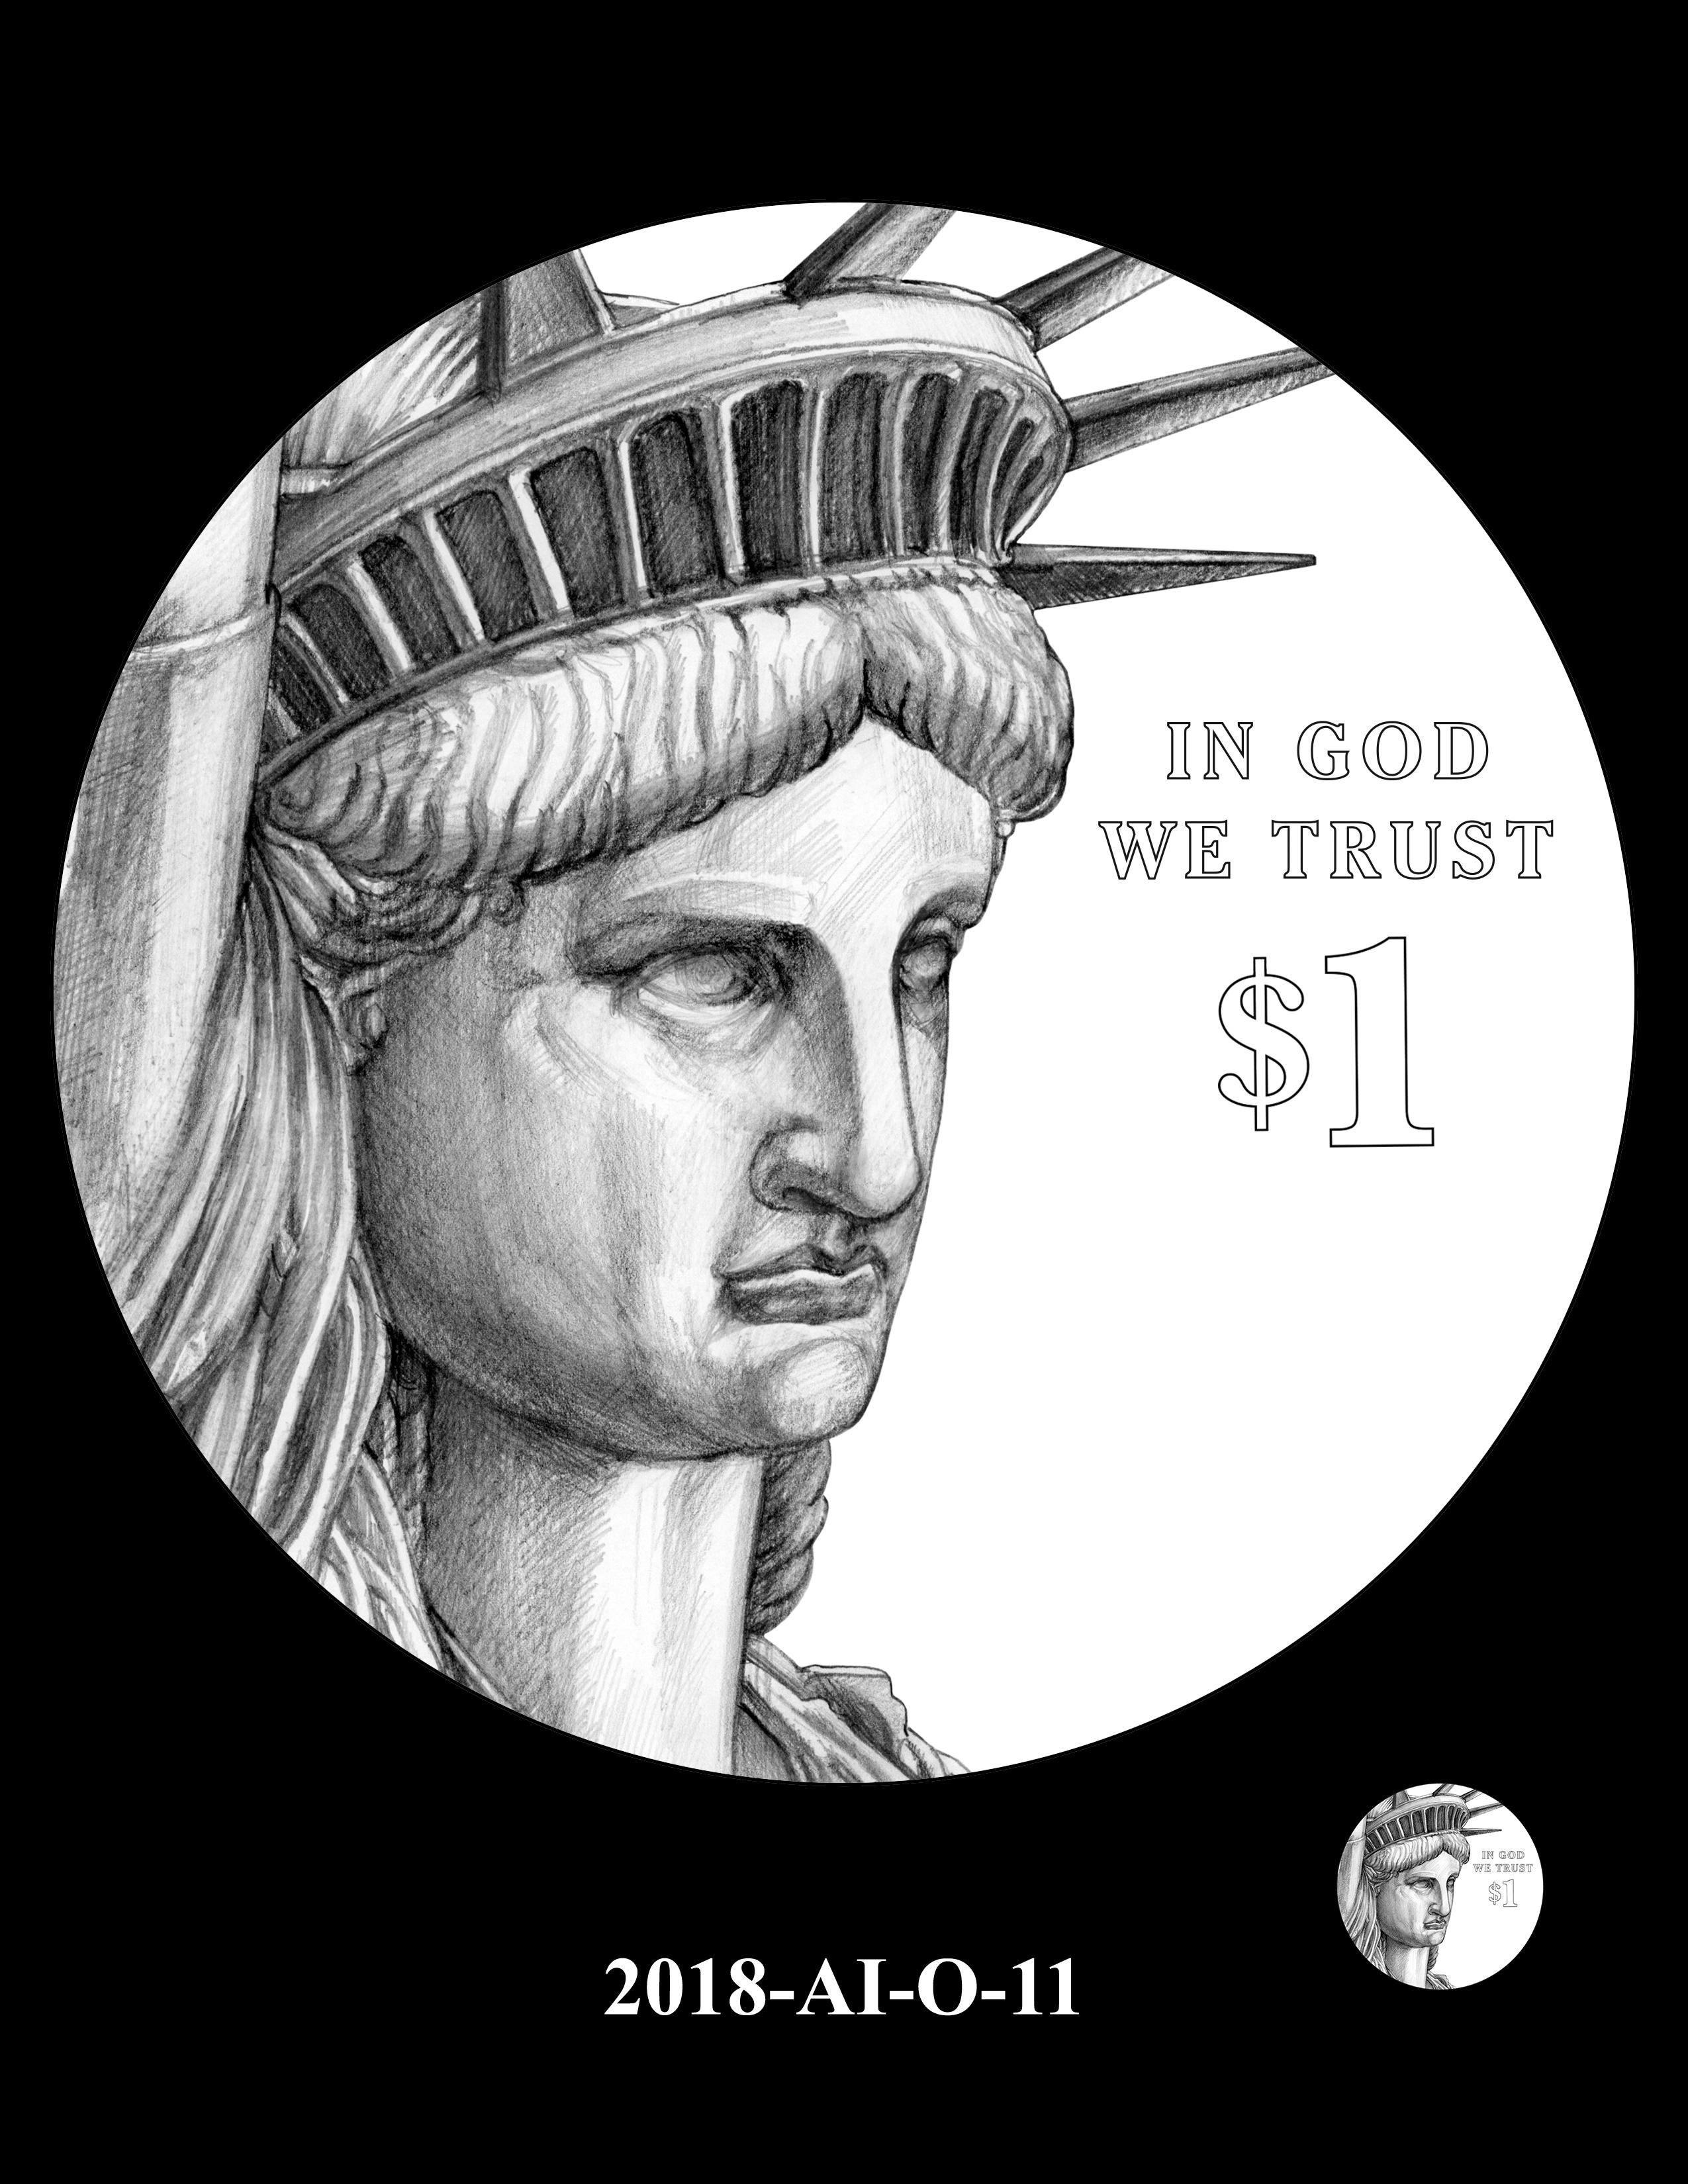 2018-AI-O-11 -- 2018 American Innovation $1 Coin